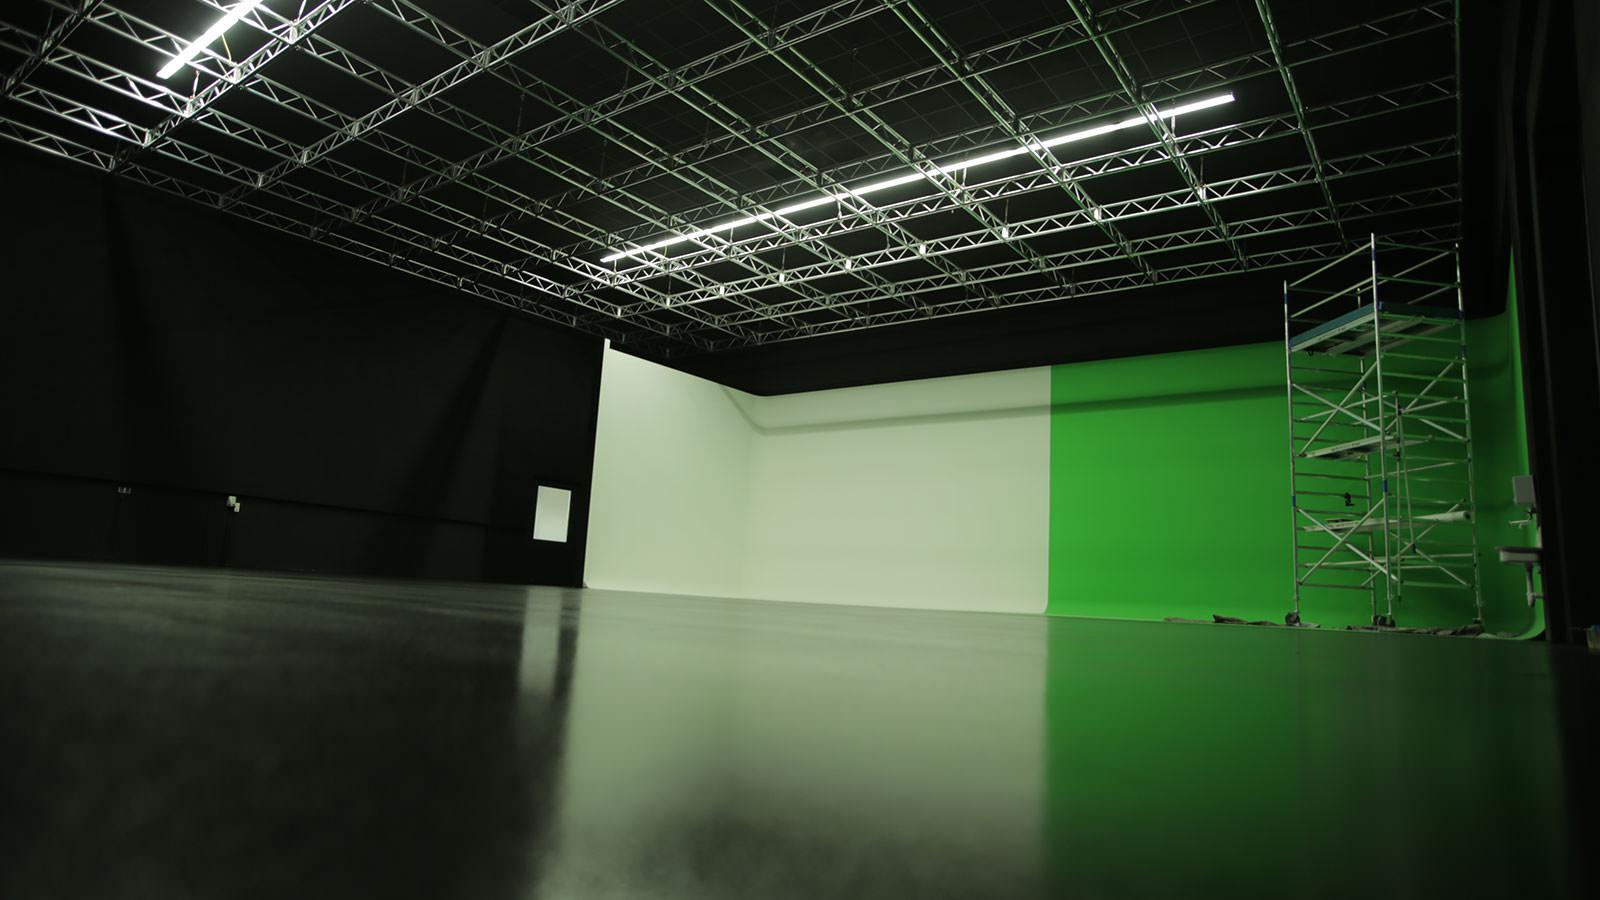 RA1 Studios